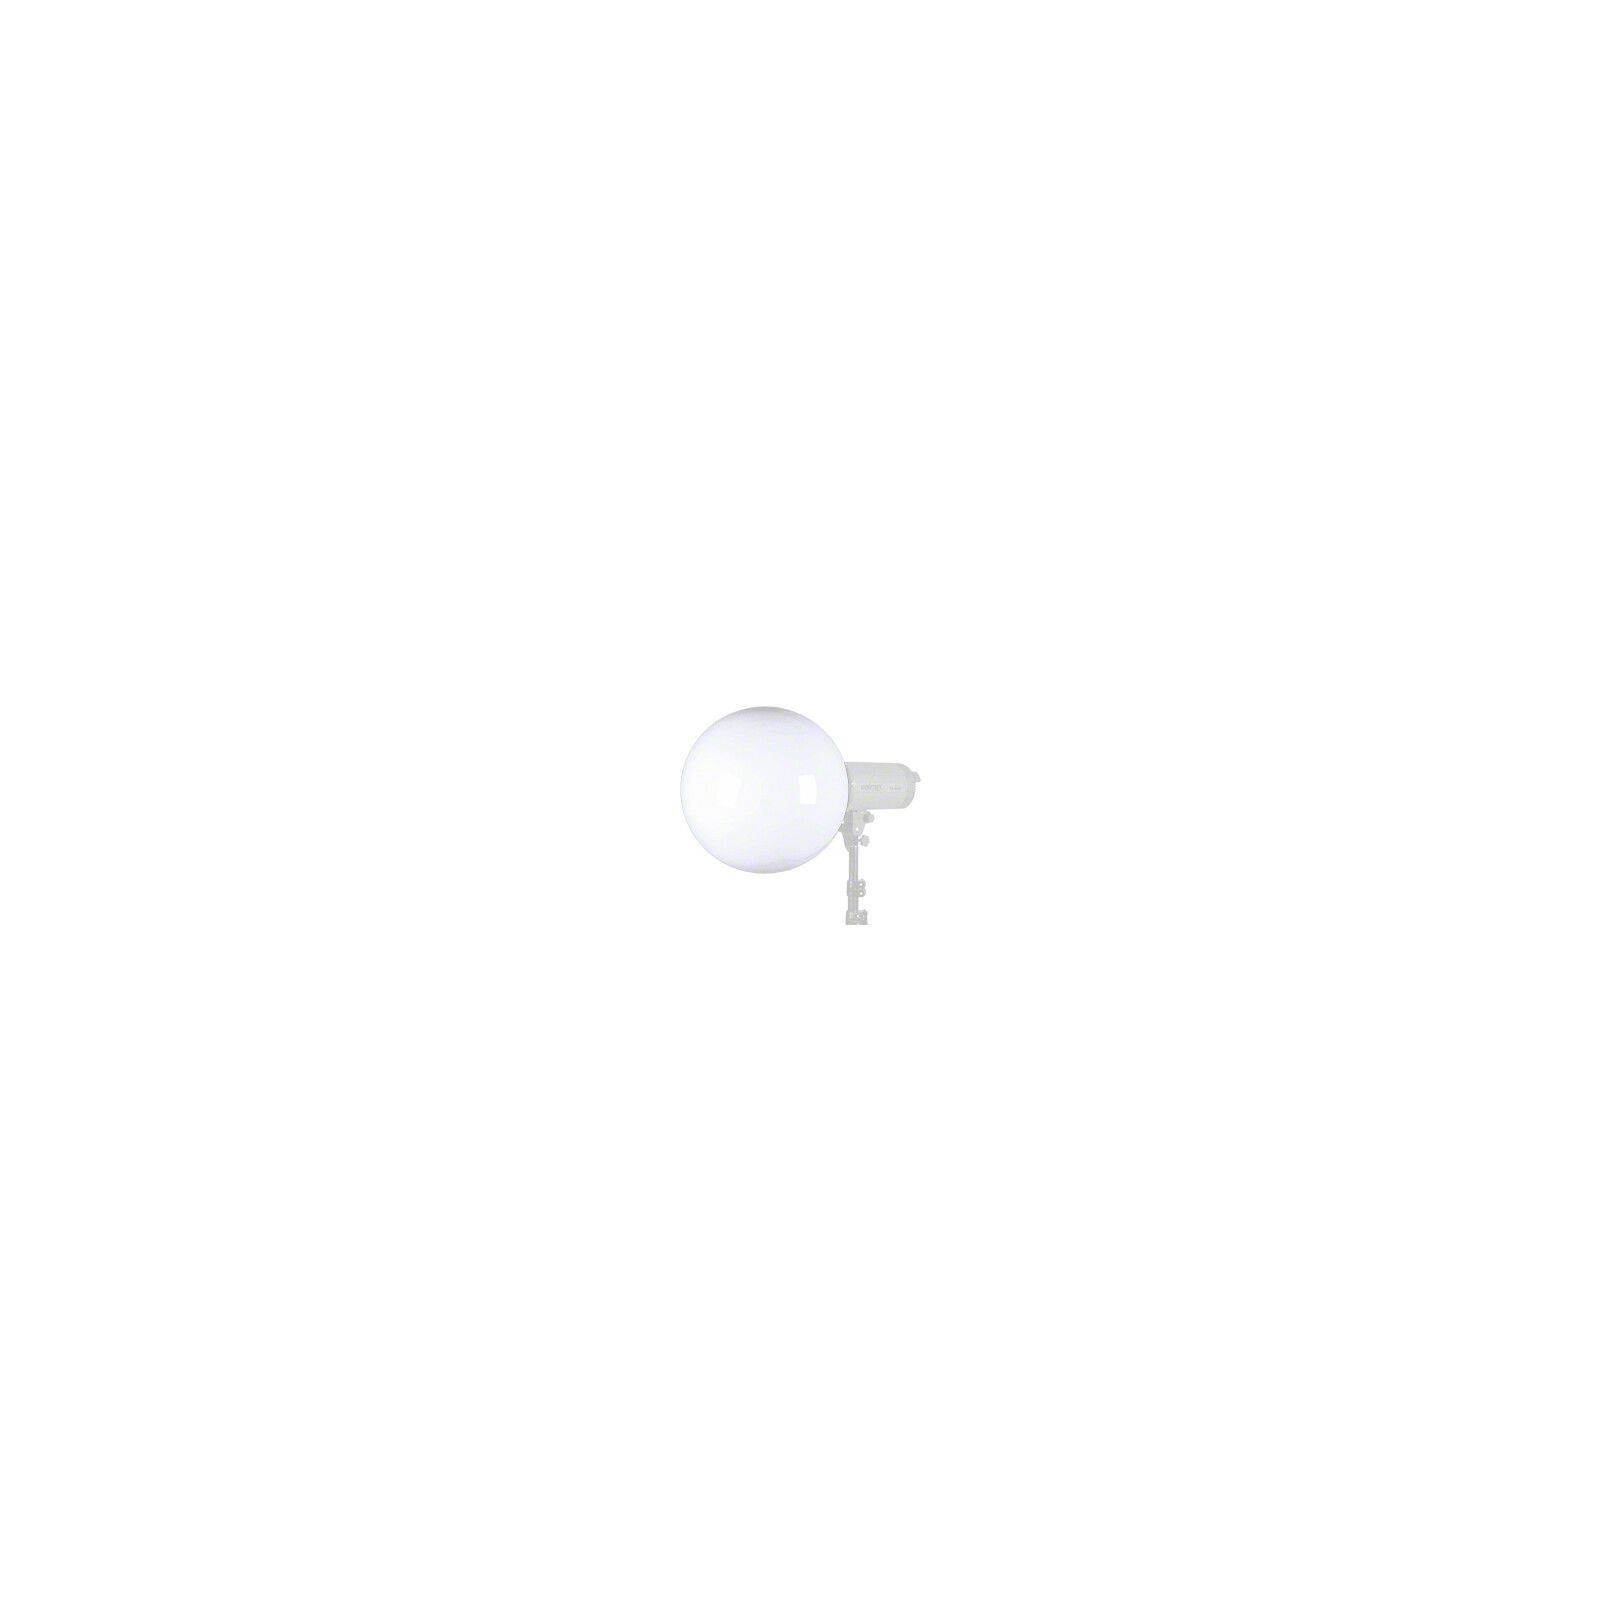 walimex Univ. Diffusorkugel, 40cm Electra small